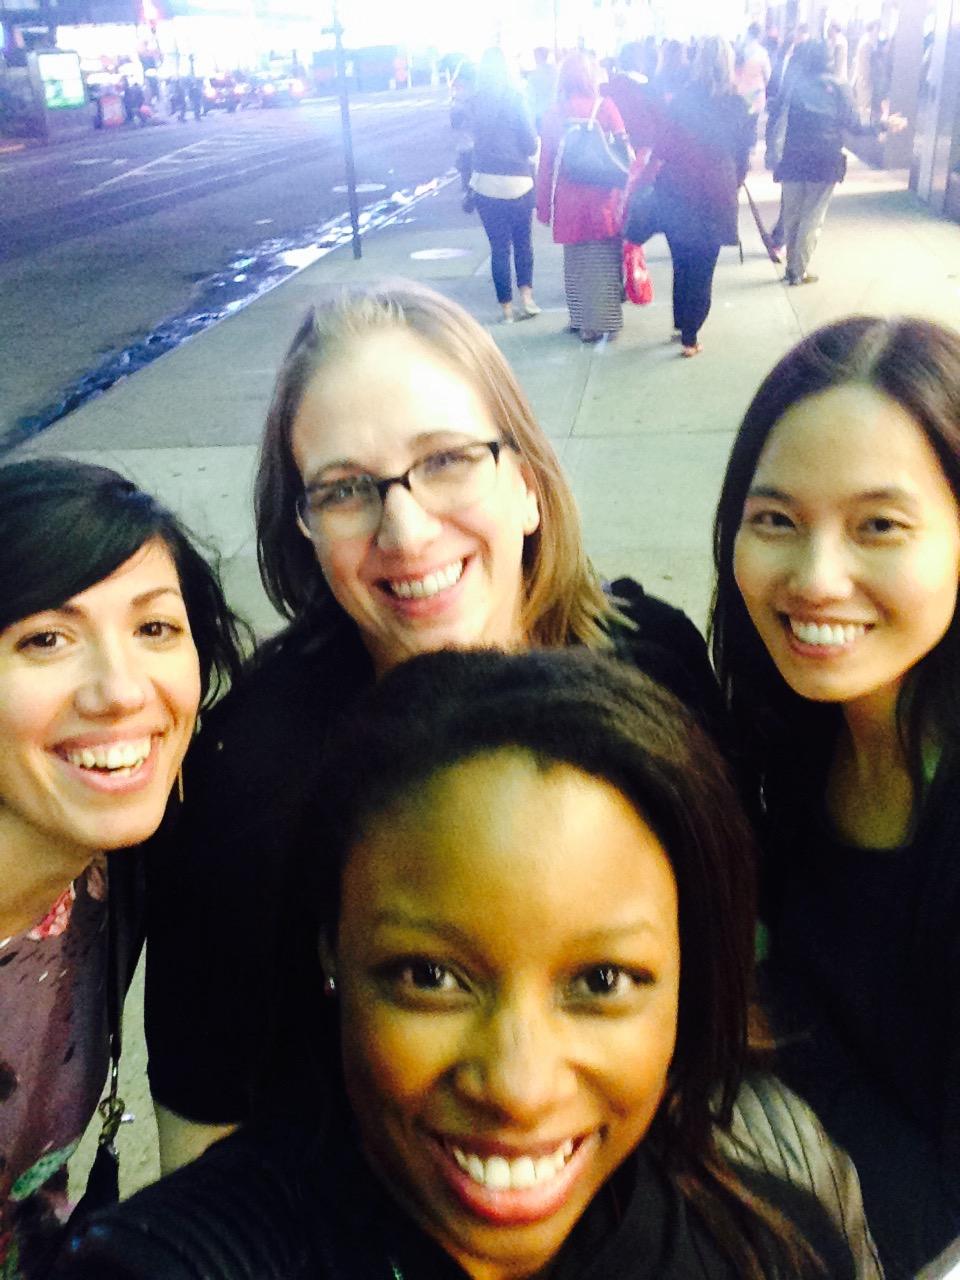 Compulsory Times Square tourist selfie!